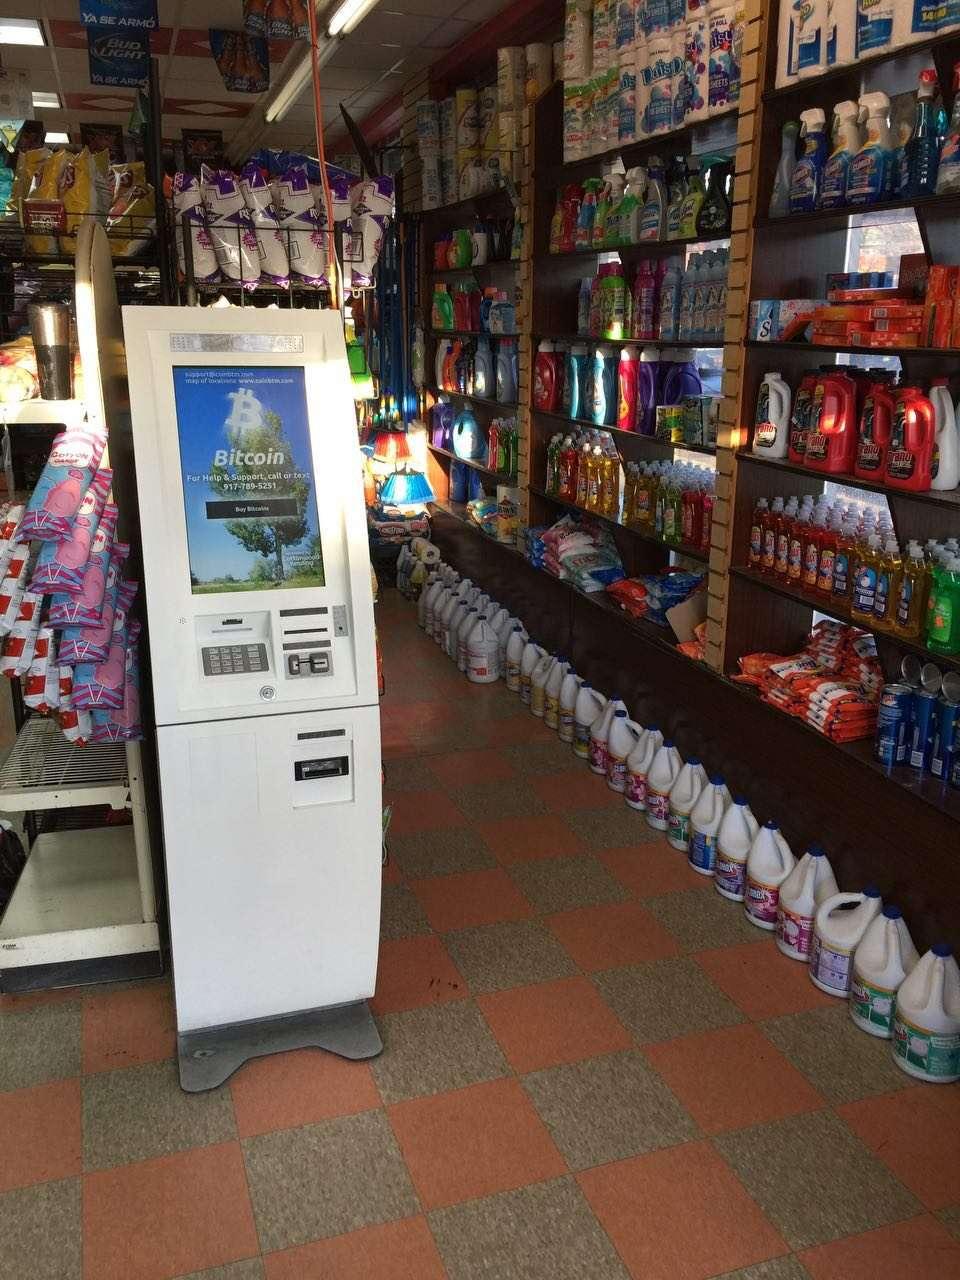 CoinBTM - Bitcoin ATM - atm  | Photo 5 of 7 | Address: 5401 Flatlands Ave, Brooklyn, NY 11234, USA | Phone: (917) 789-5251